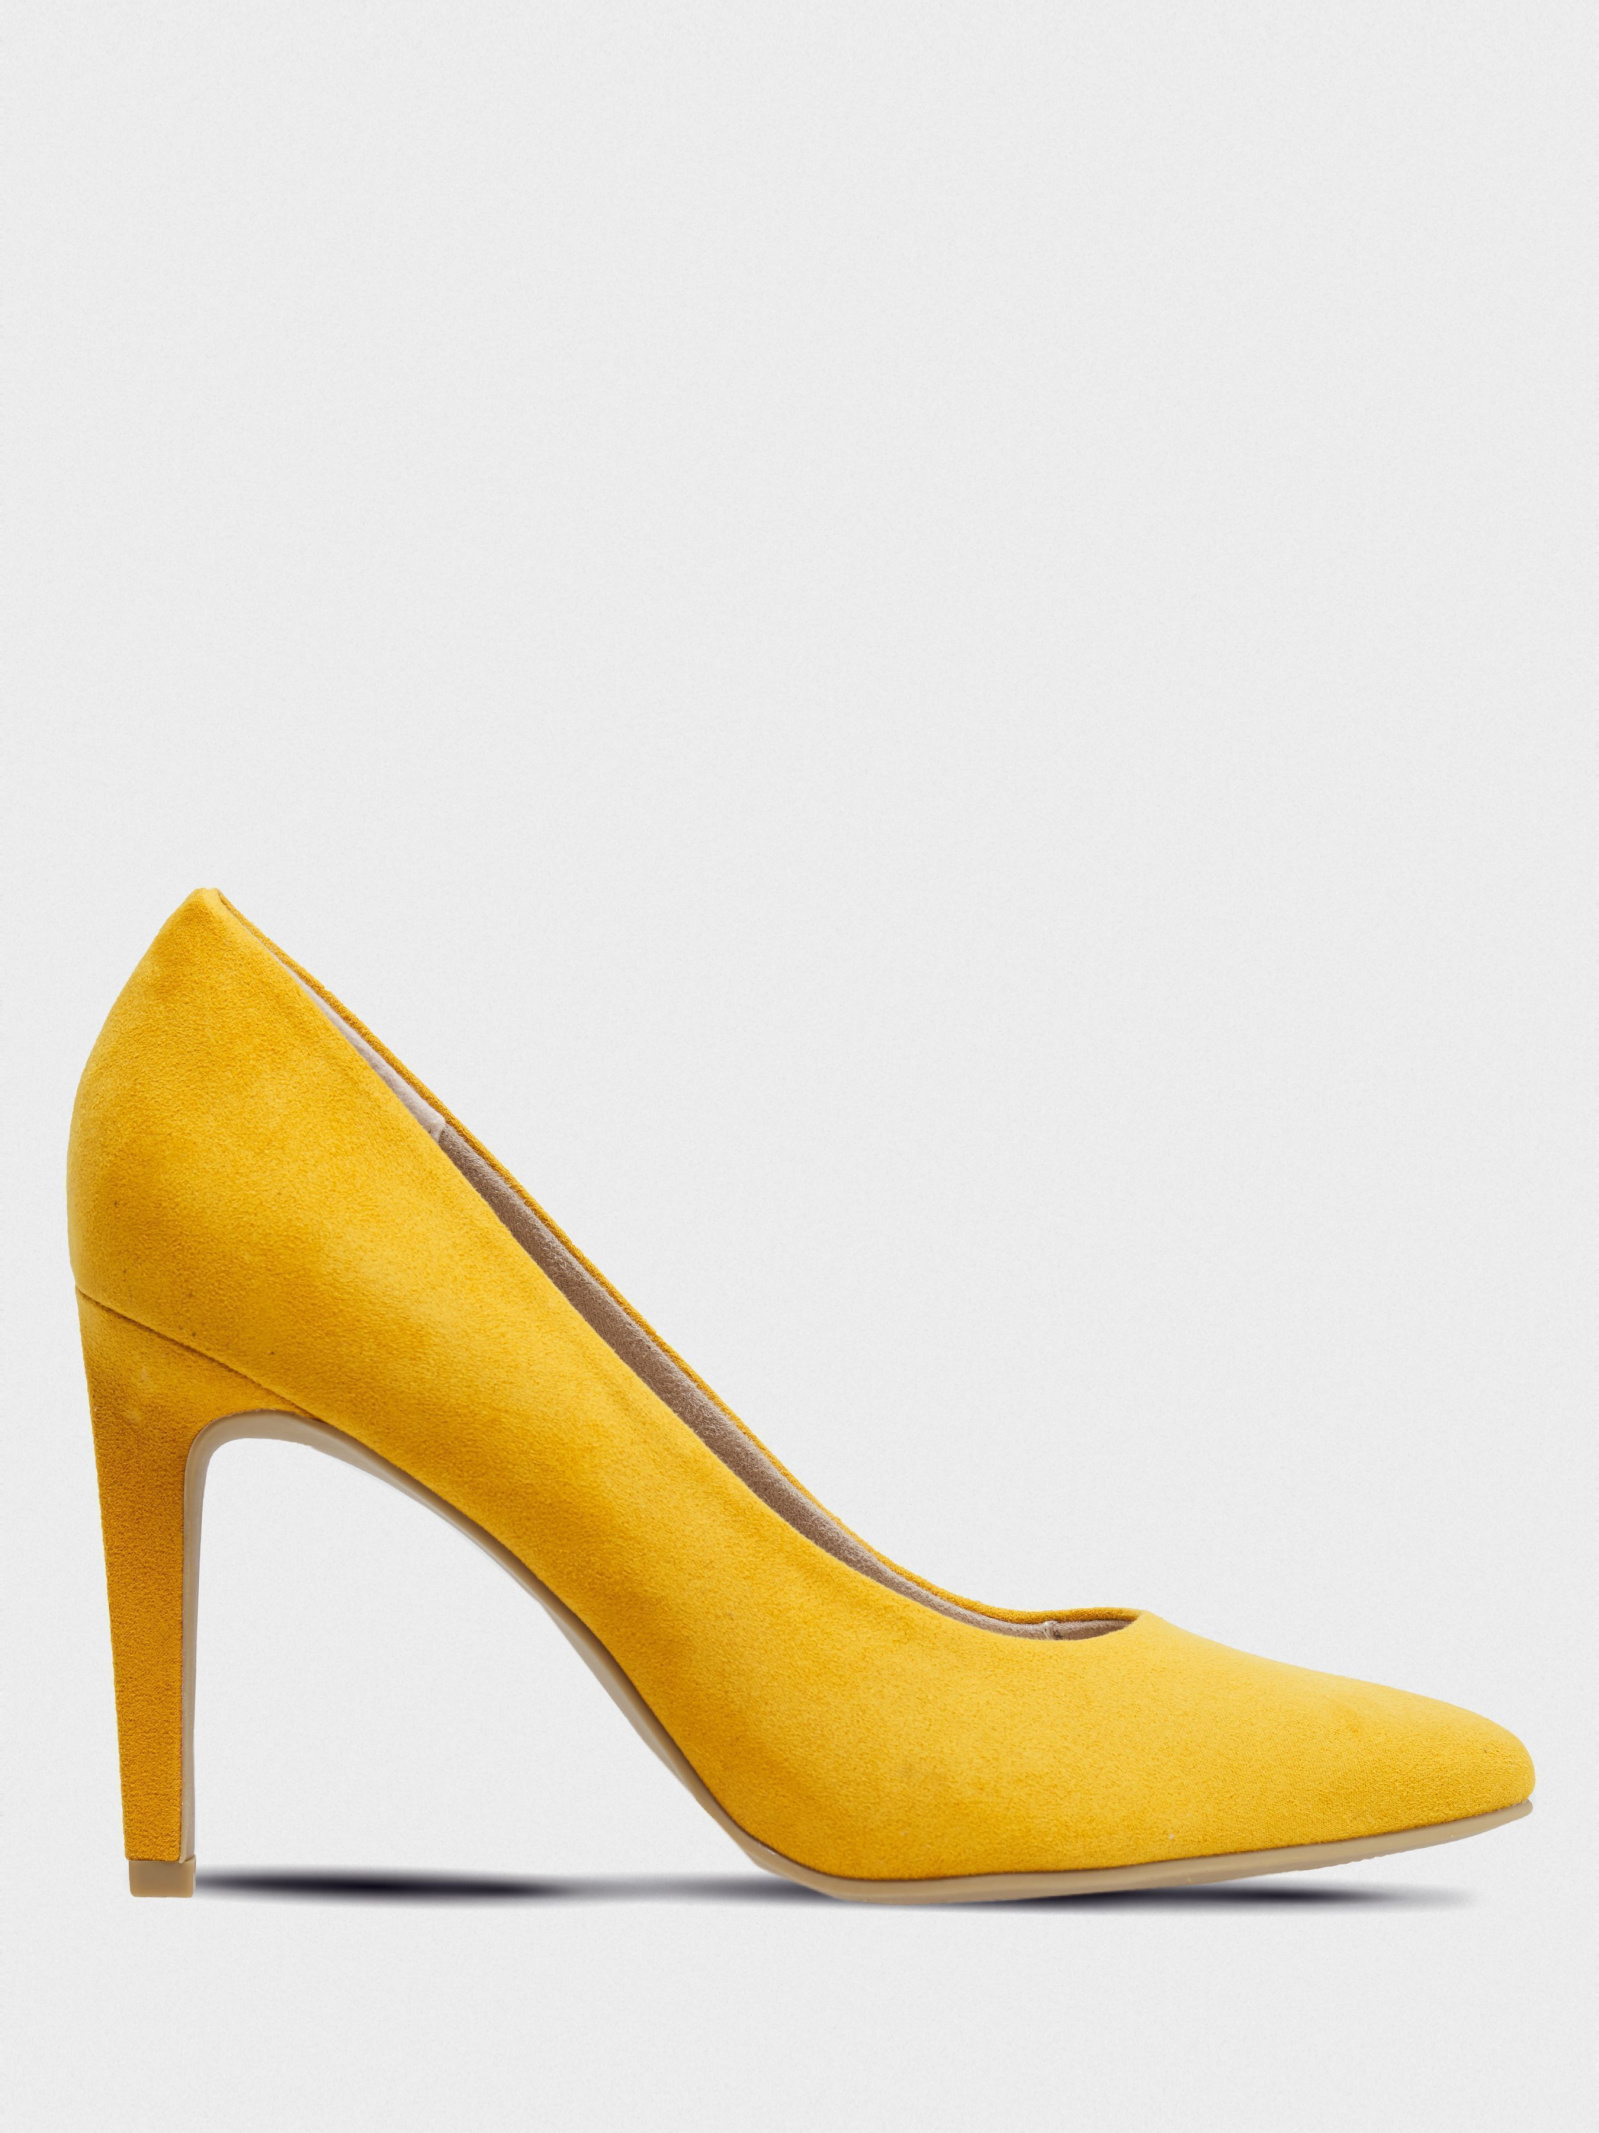 Туфли женские Marco Tozzi 3H342 цена, 2017